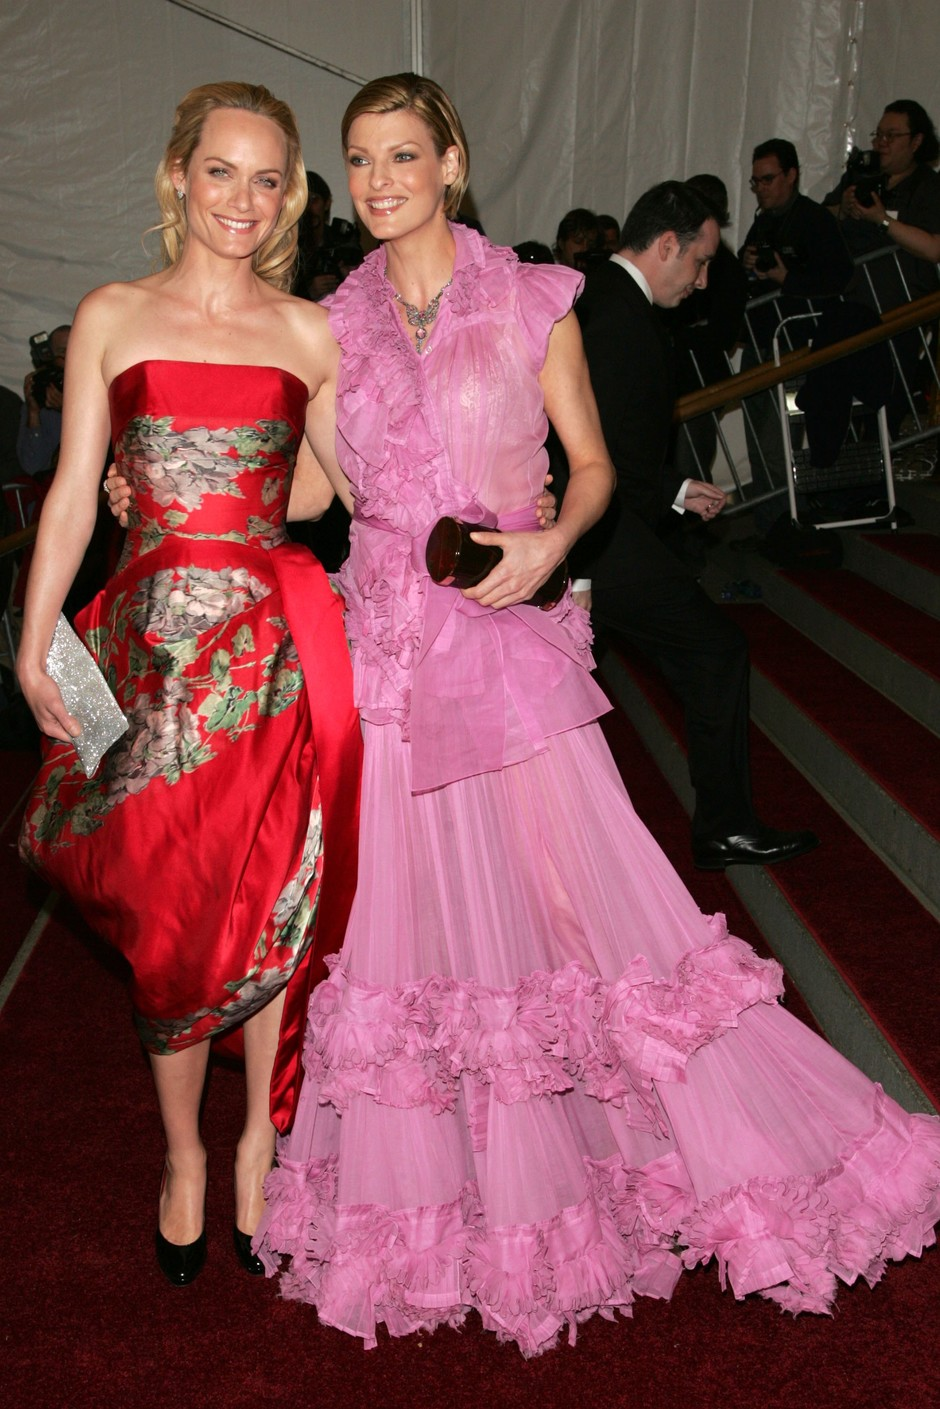 Амбер Валлетта и Линда Евангелиста, 2006 год